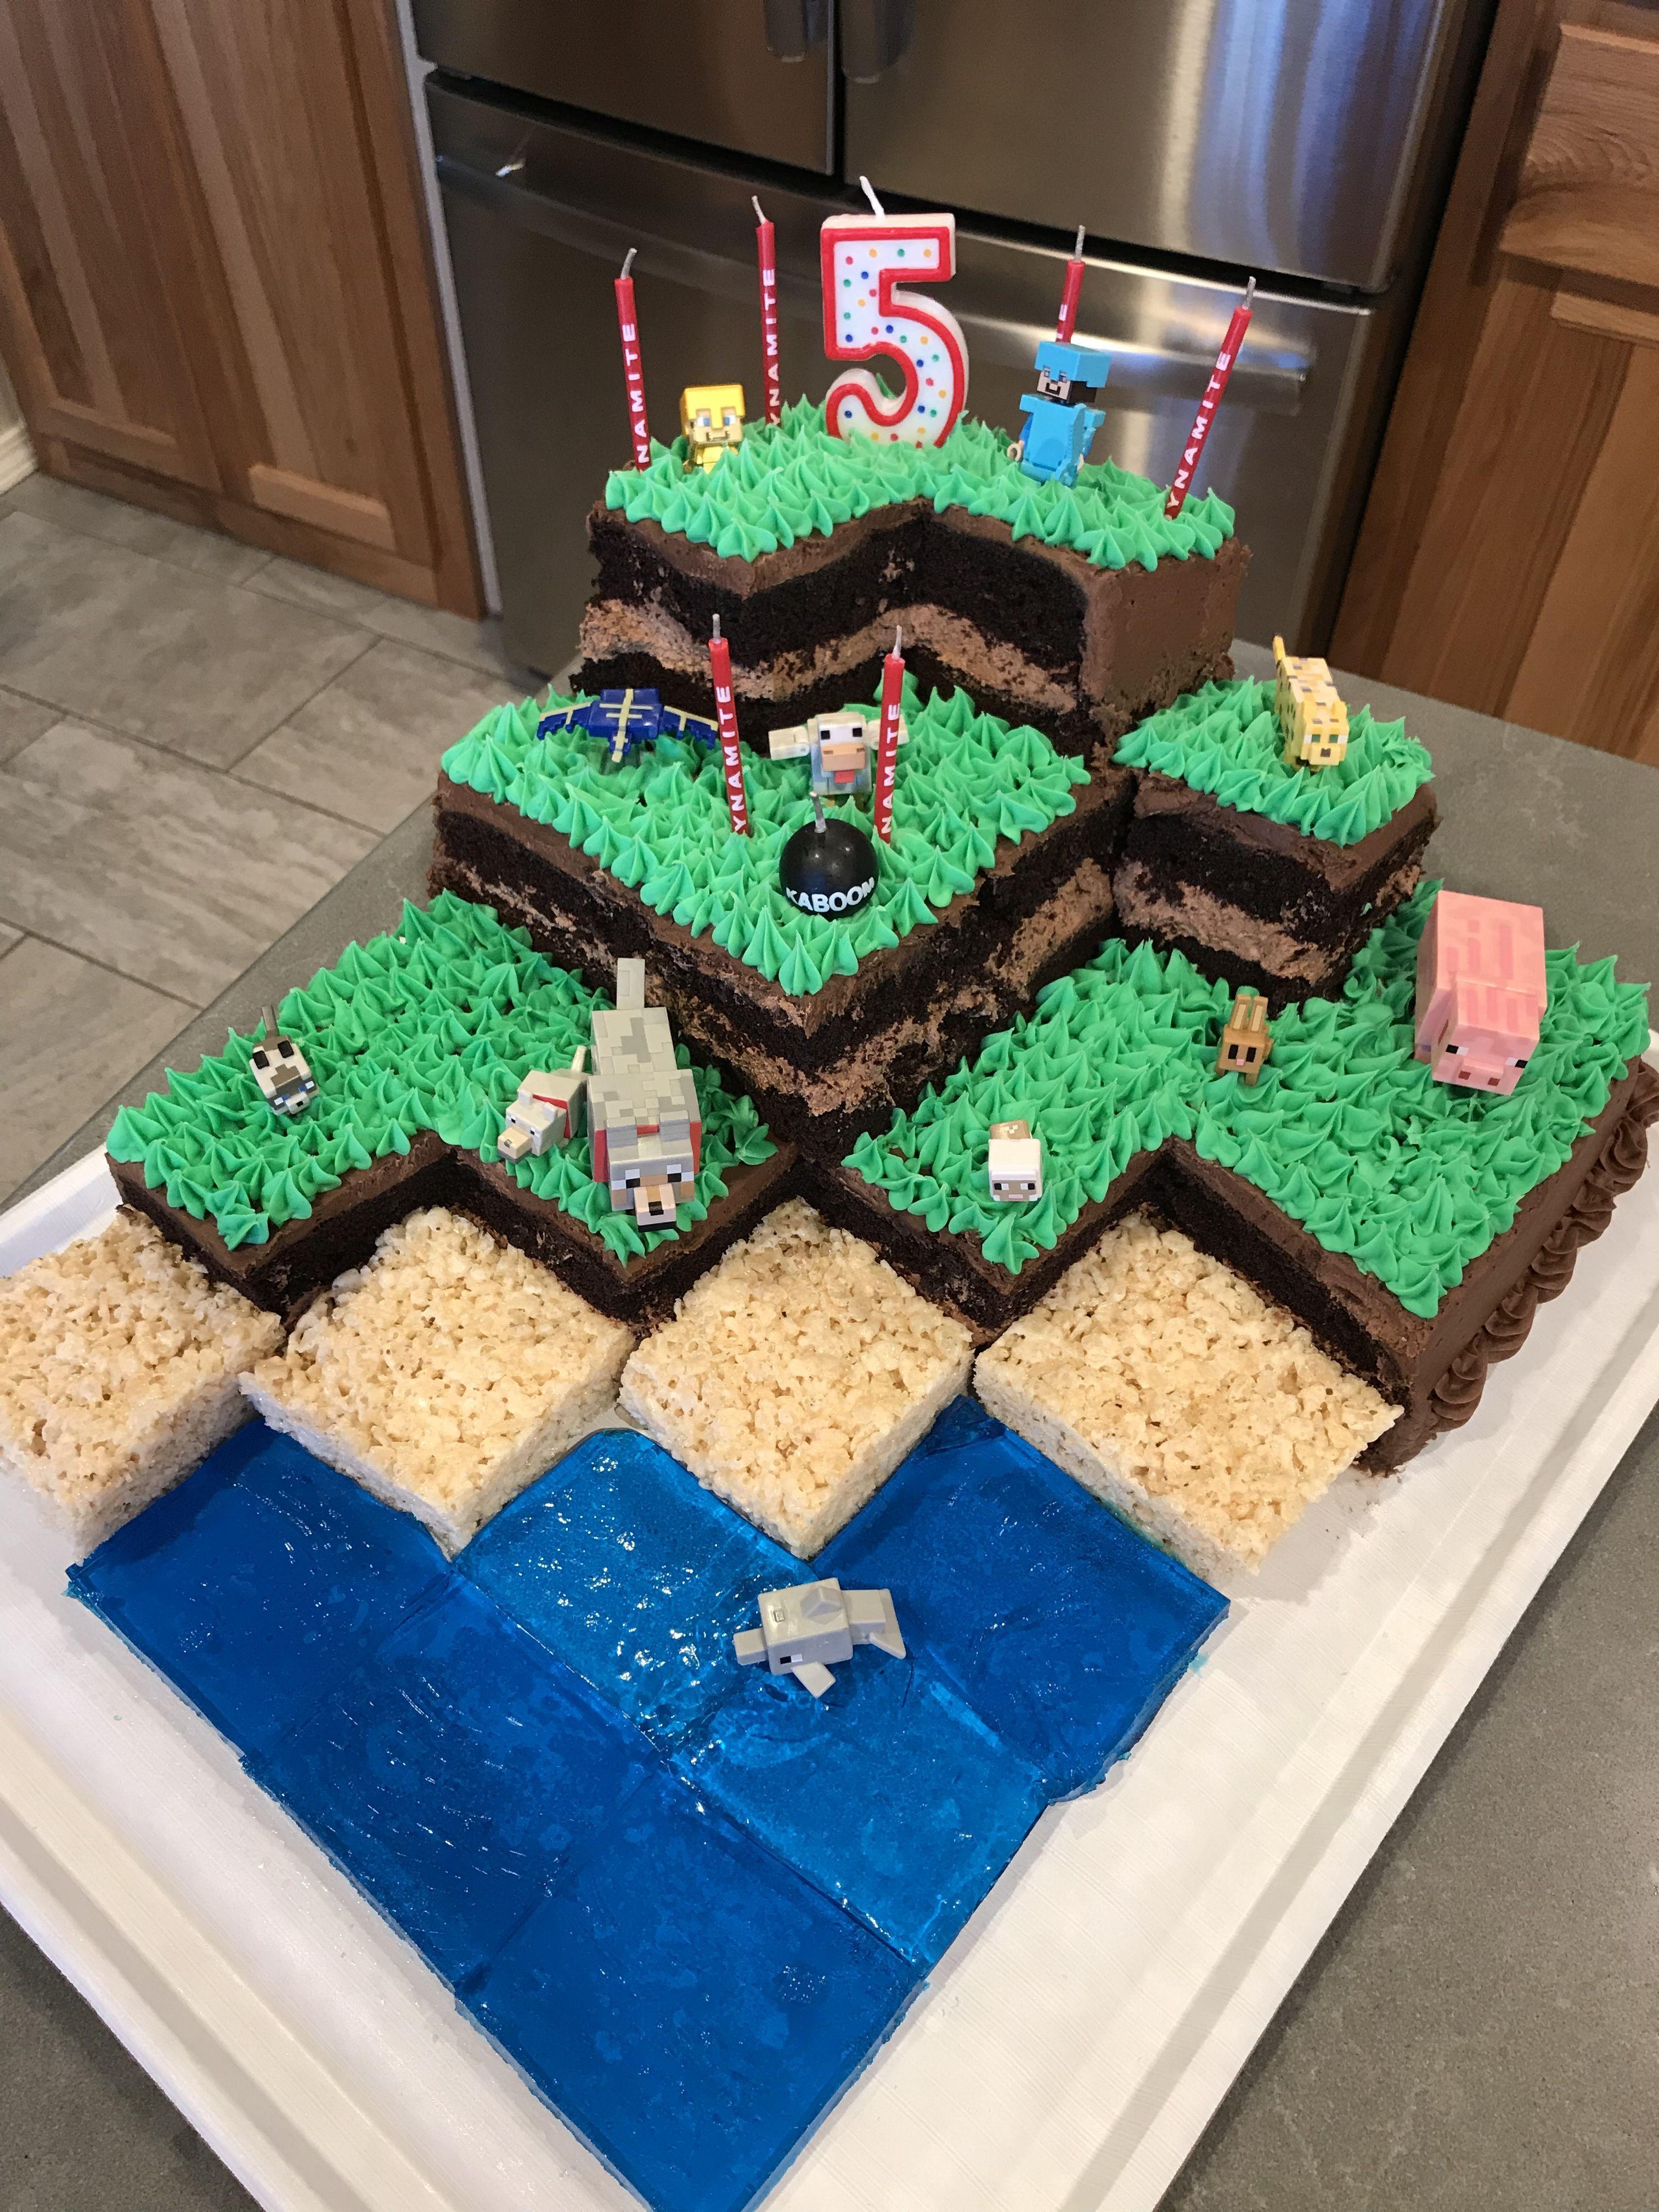 Costco cake turned into minecraft cake in 2020 minecraft